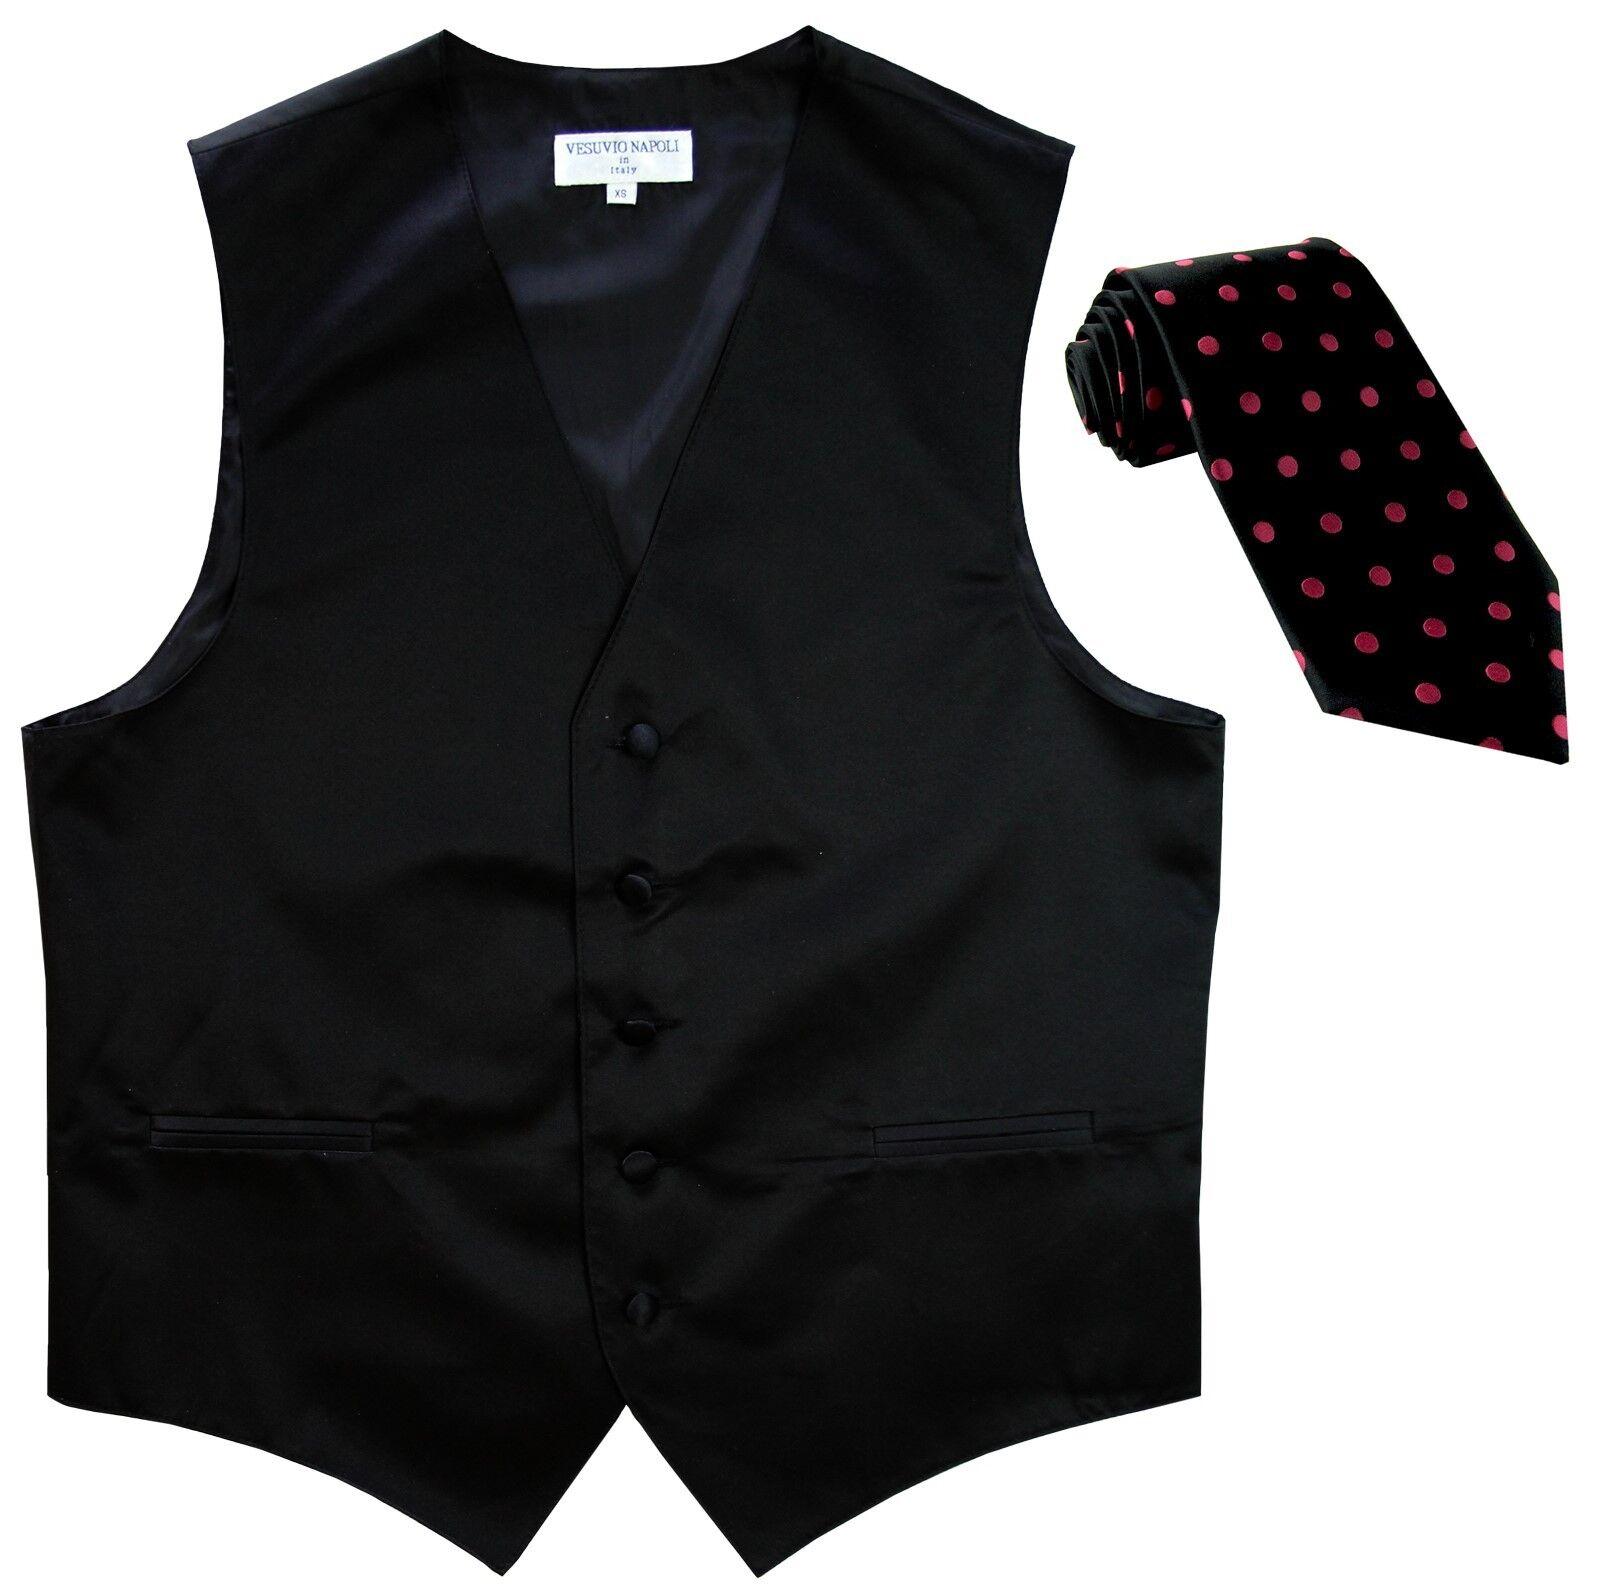 New Men's Black formal vest tuxedo Waistcoat_black Hot Pink Dots Necktie prom